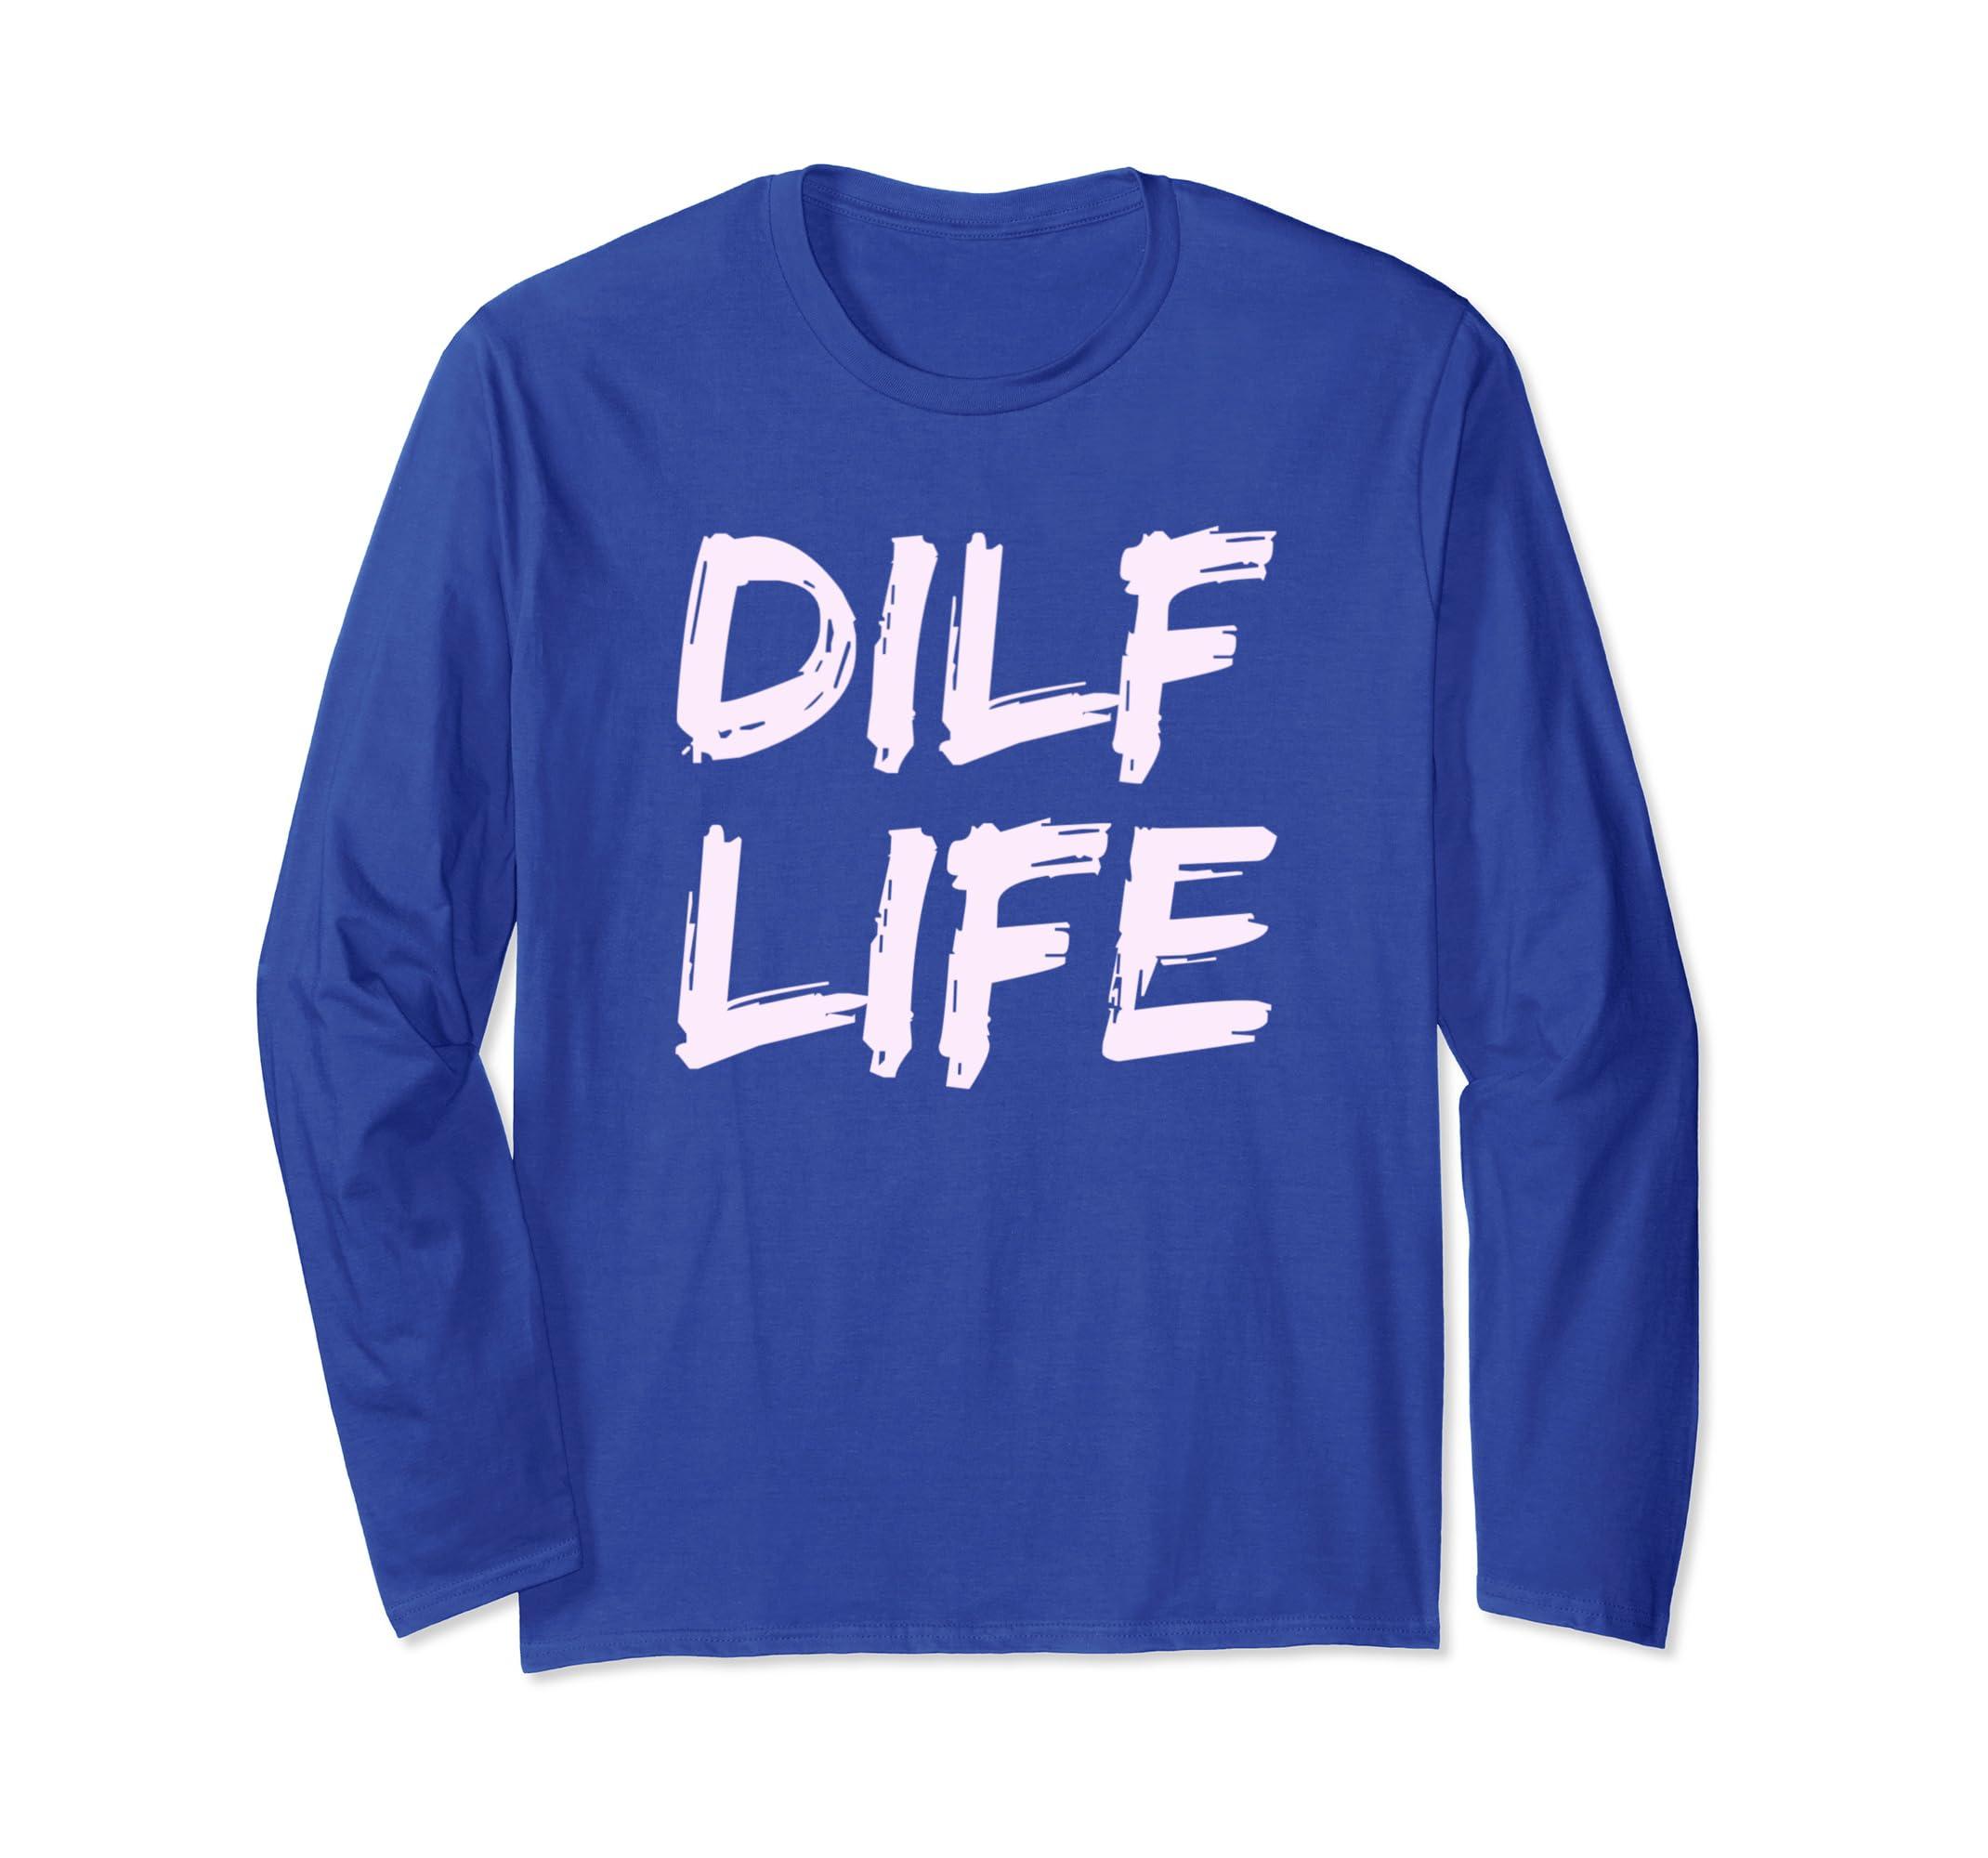 30ace1b23 Amazon.com: Mens Funny DILF LIFE Long Sleeve Shirt Dad Humor Tee: Clothing